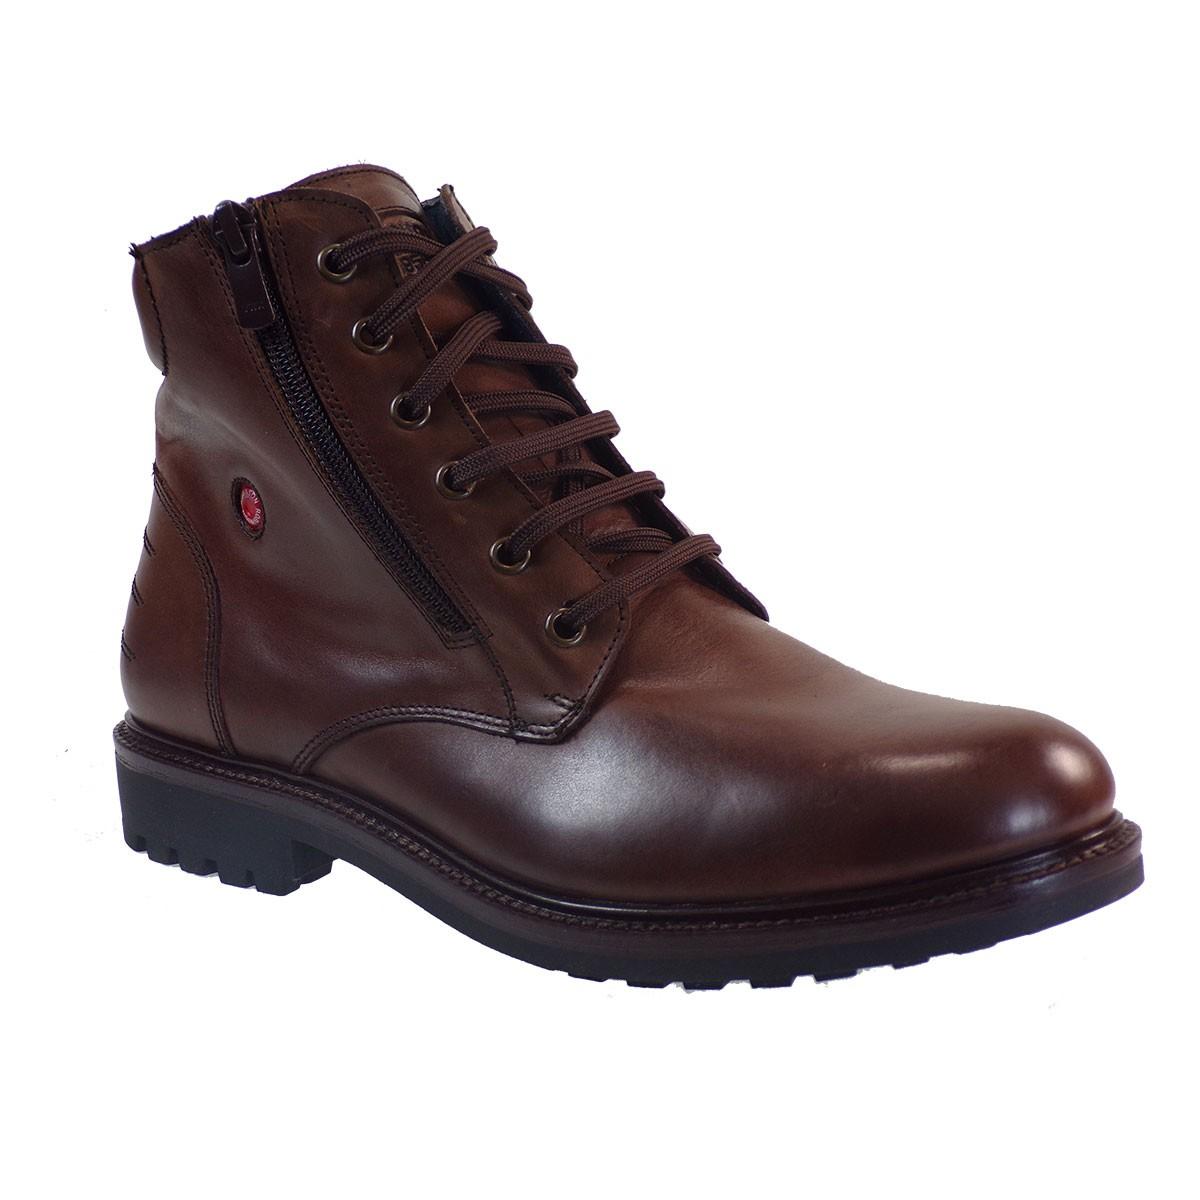 Robinson Ανδρικά Παπούτσια Μποτάκια Αρβυλάκια 1706 Καφέ Δέρμα